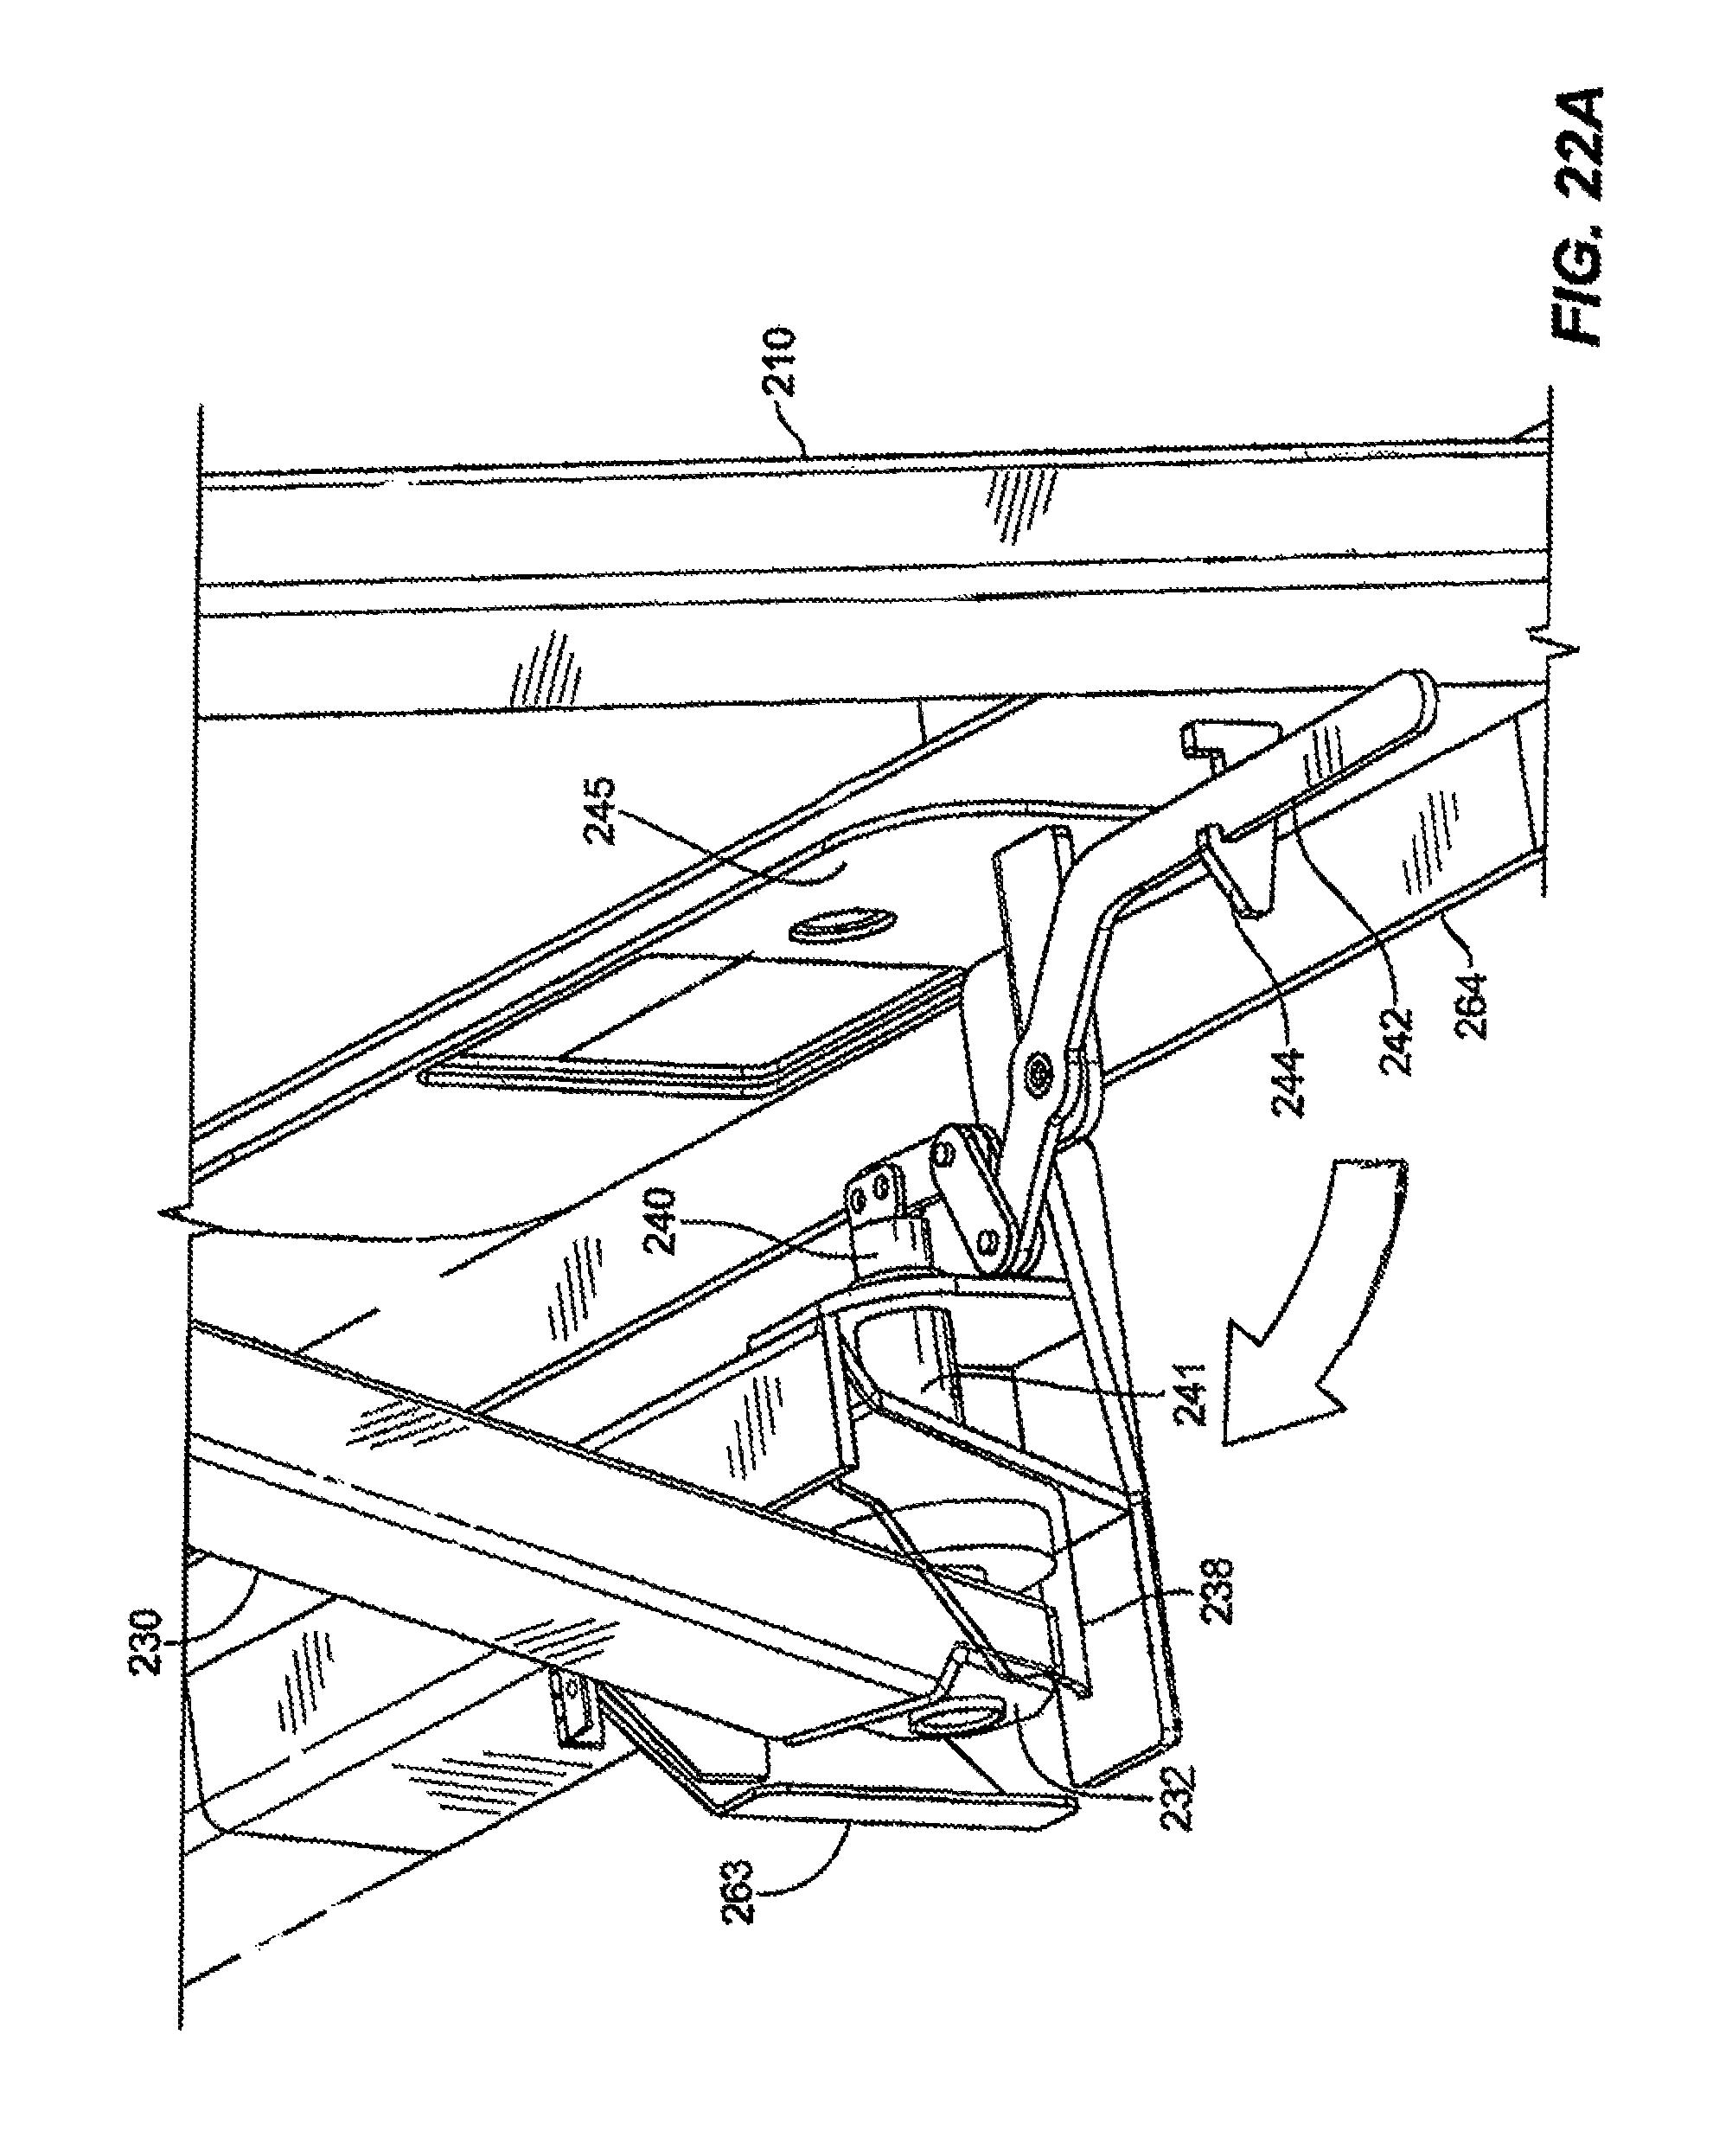 Simplicity Landlord Lawn Tractor Wiring Diagrams Troy-Bilt